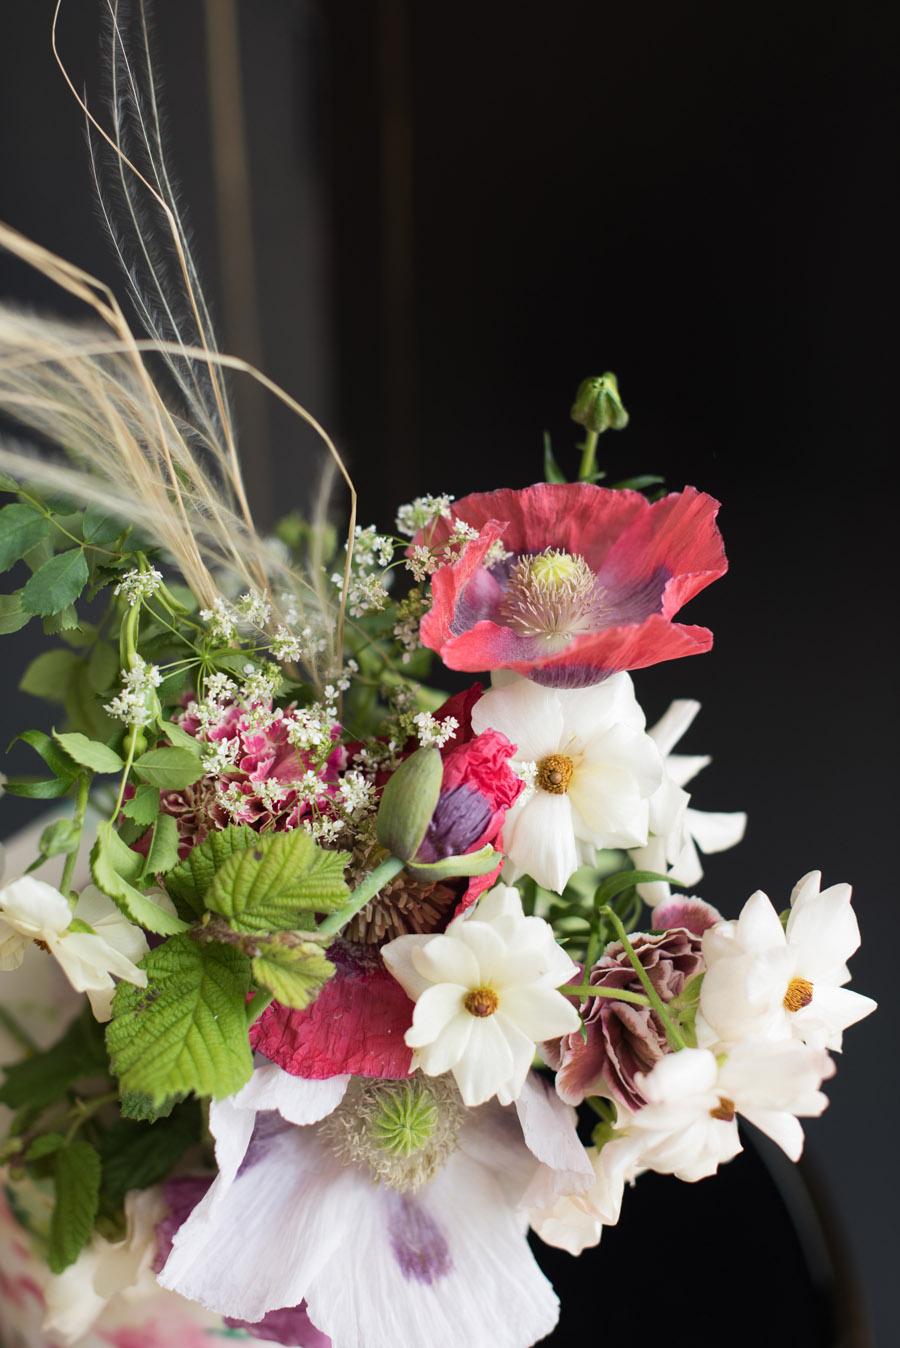 floral wedding ideas at Millbridge Court on English Wedding - photo credit Julie Michaelsen Photography (35)